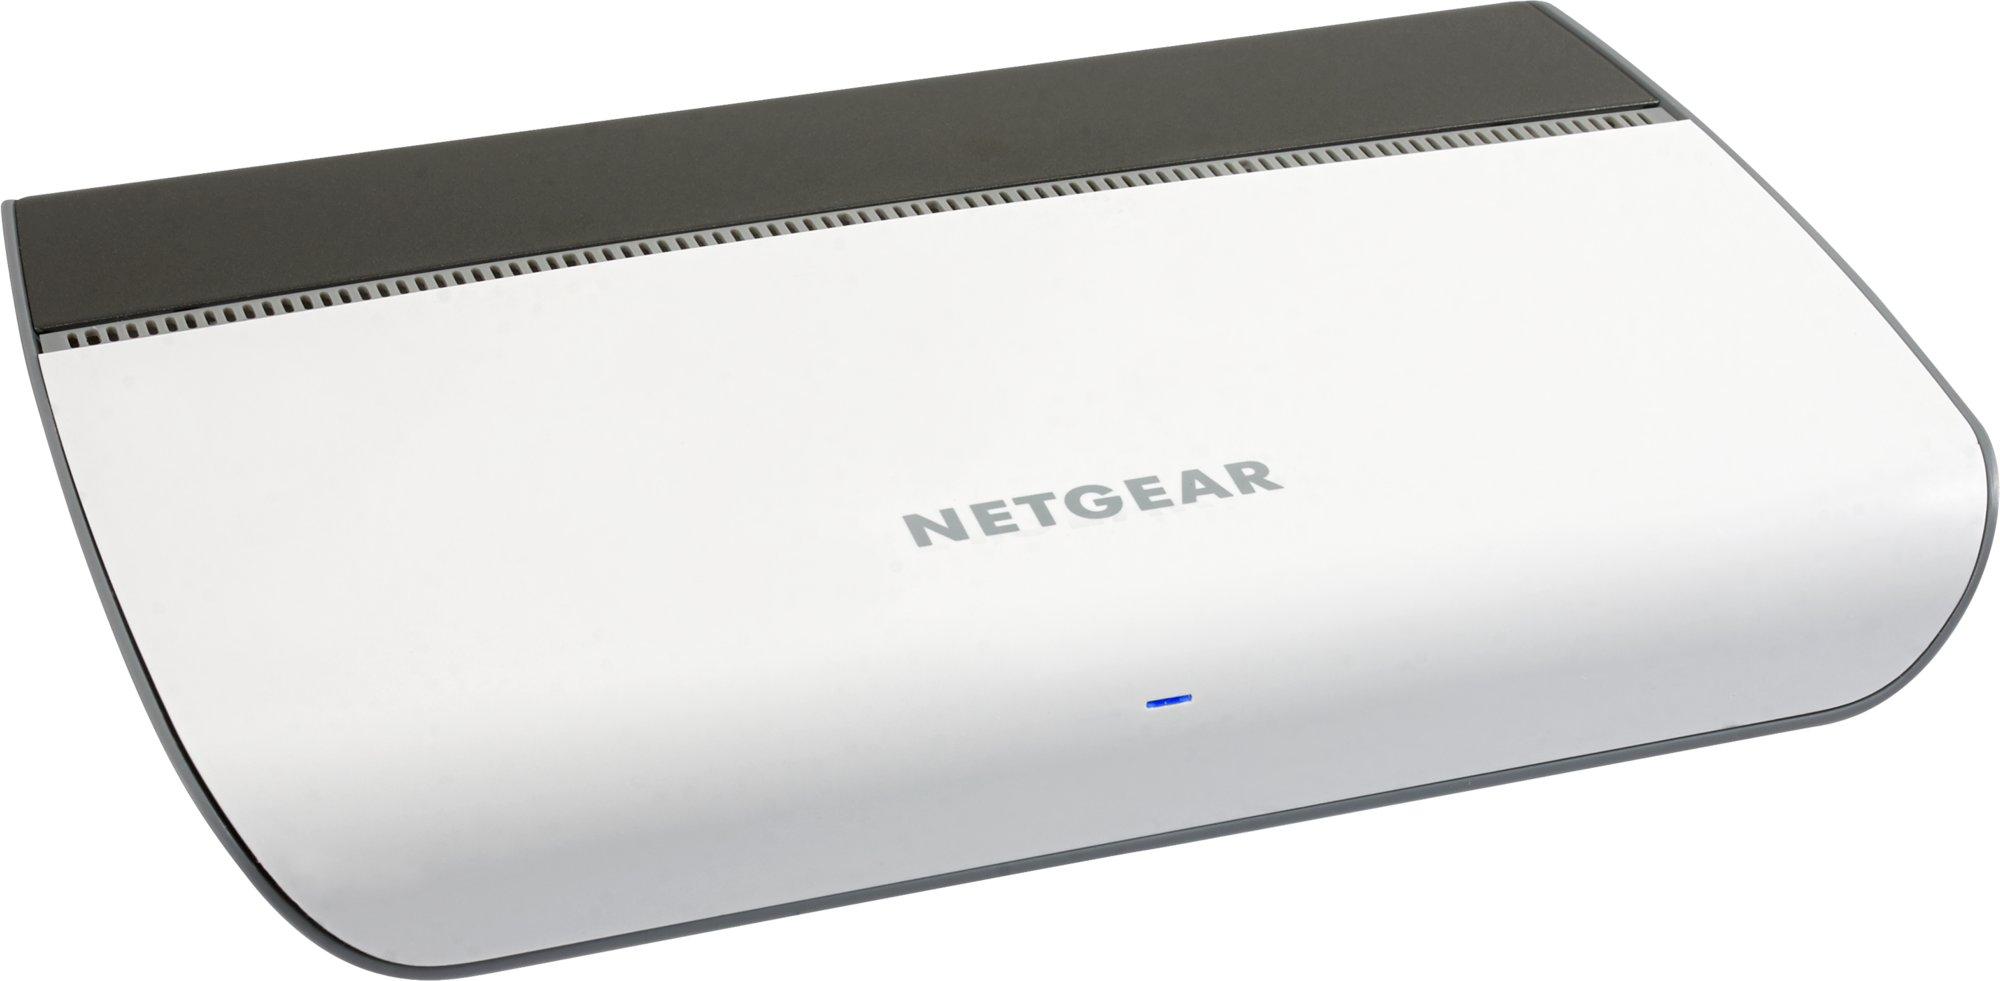 NETGEAR 8-port Gigabit Ethernet Unmanaged Switch, GS908